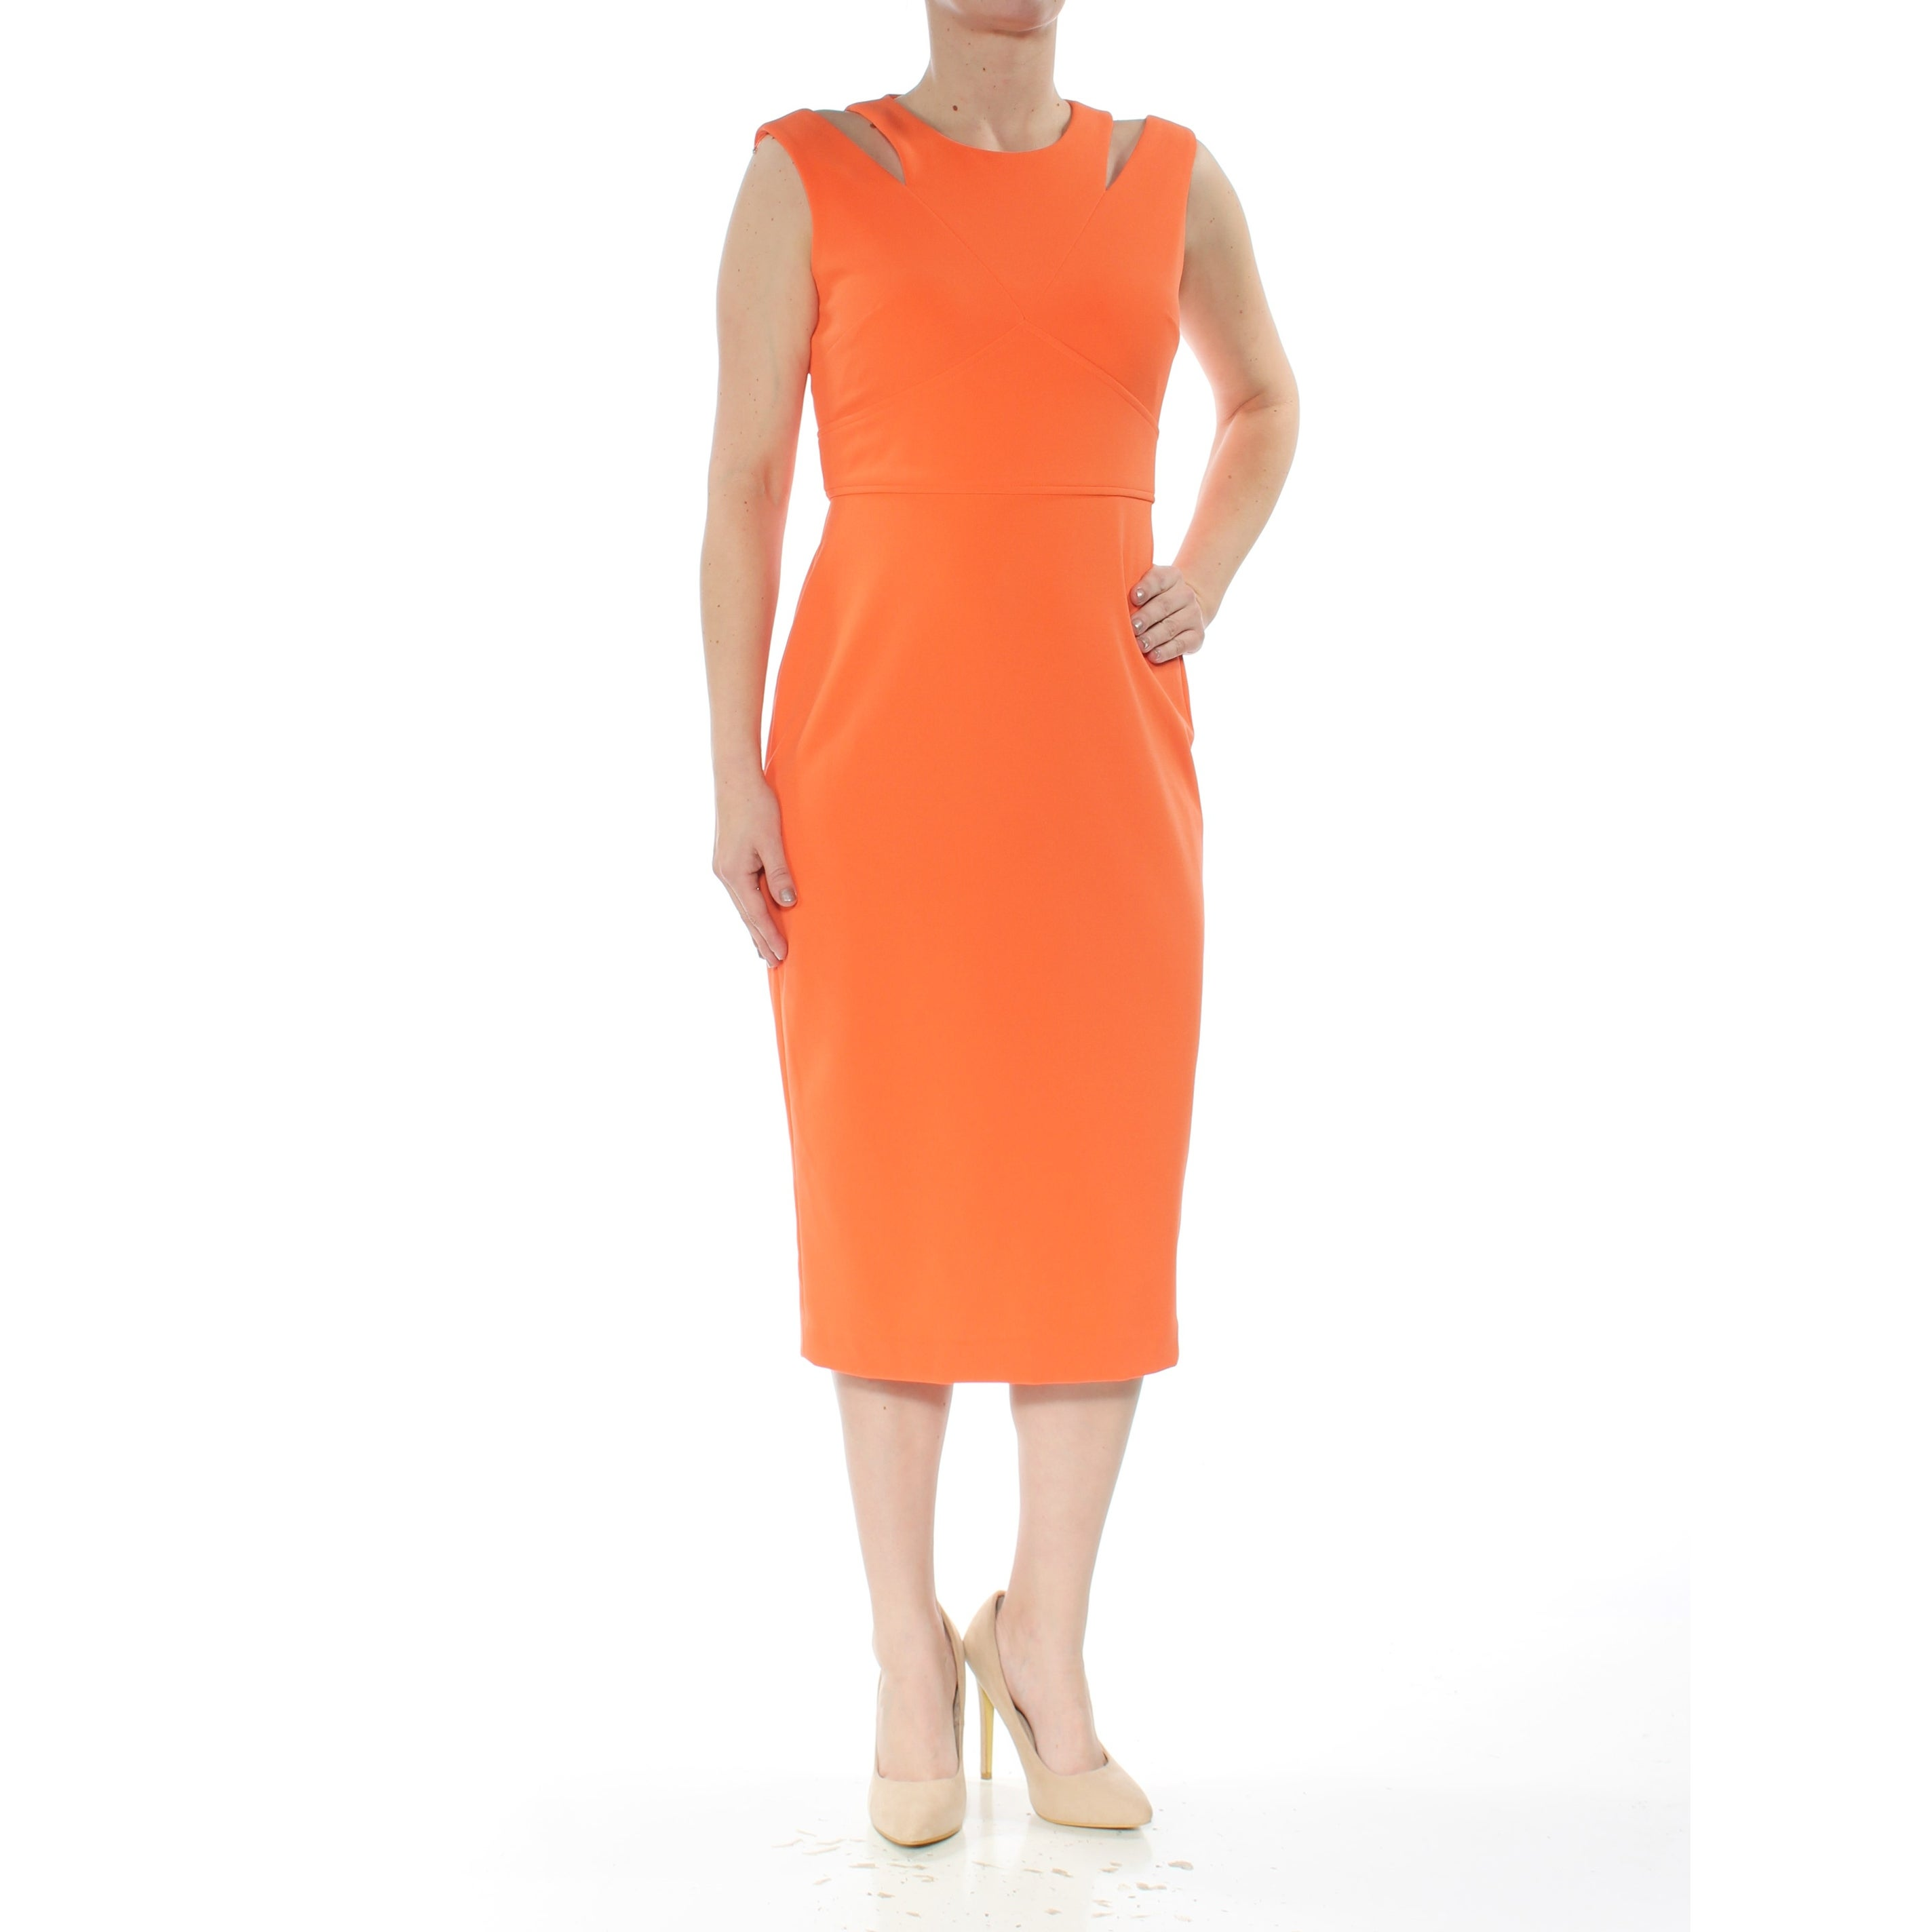 ea2f4f1dbb11 Jewel Neck Dresses